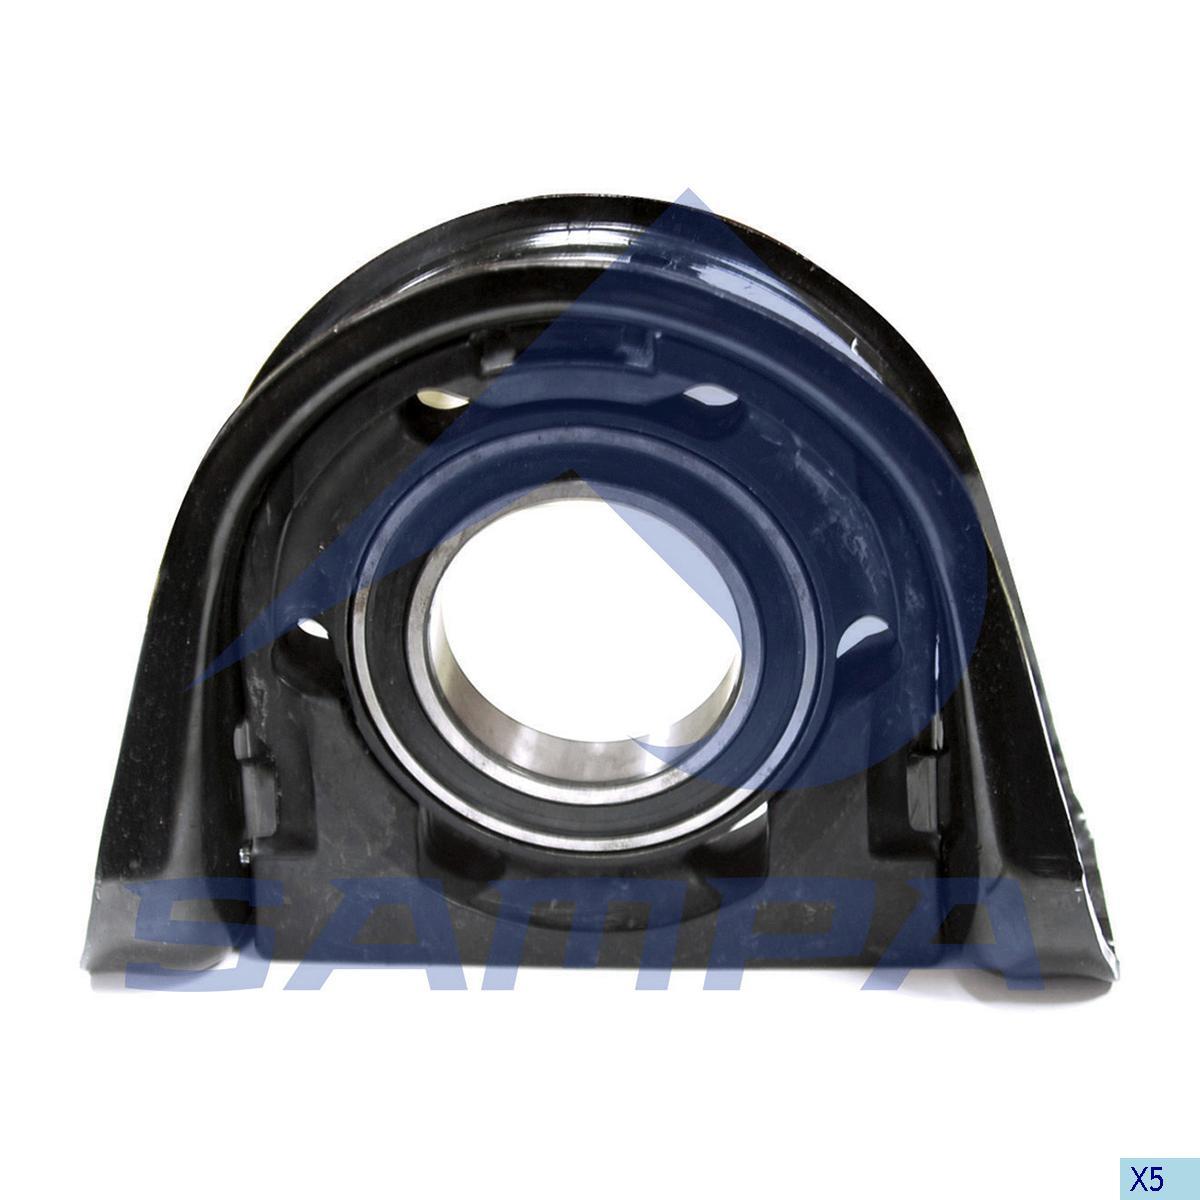 Propeller Shaft Bearing, Volvo, Propeller Shaft